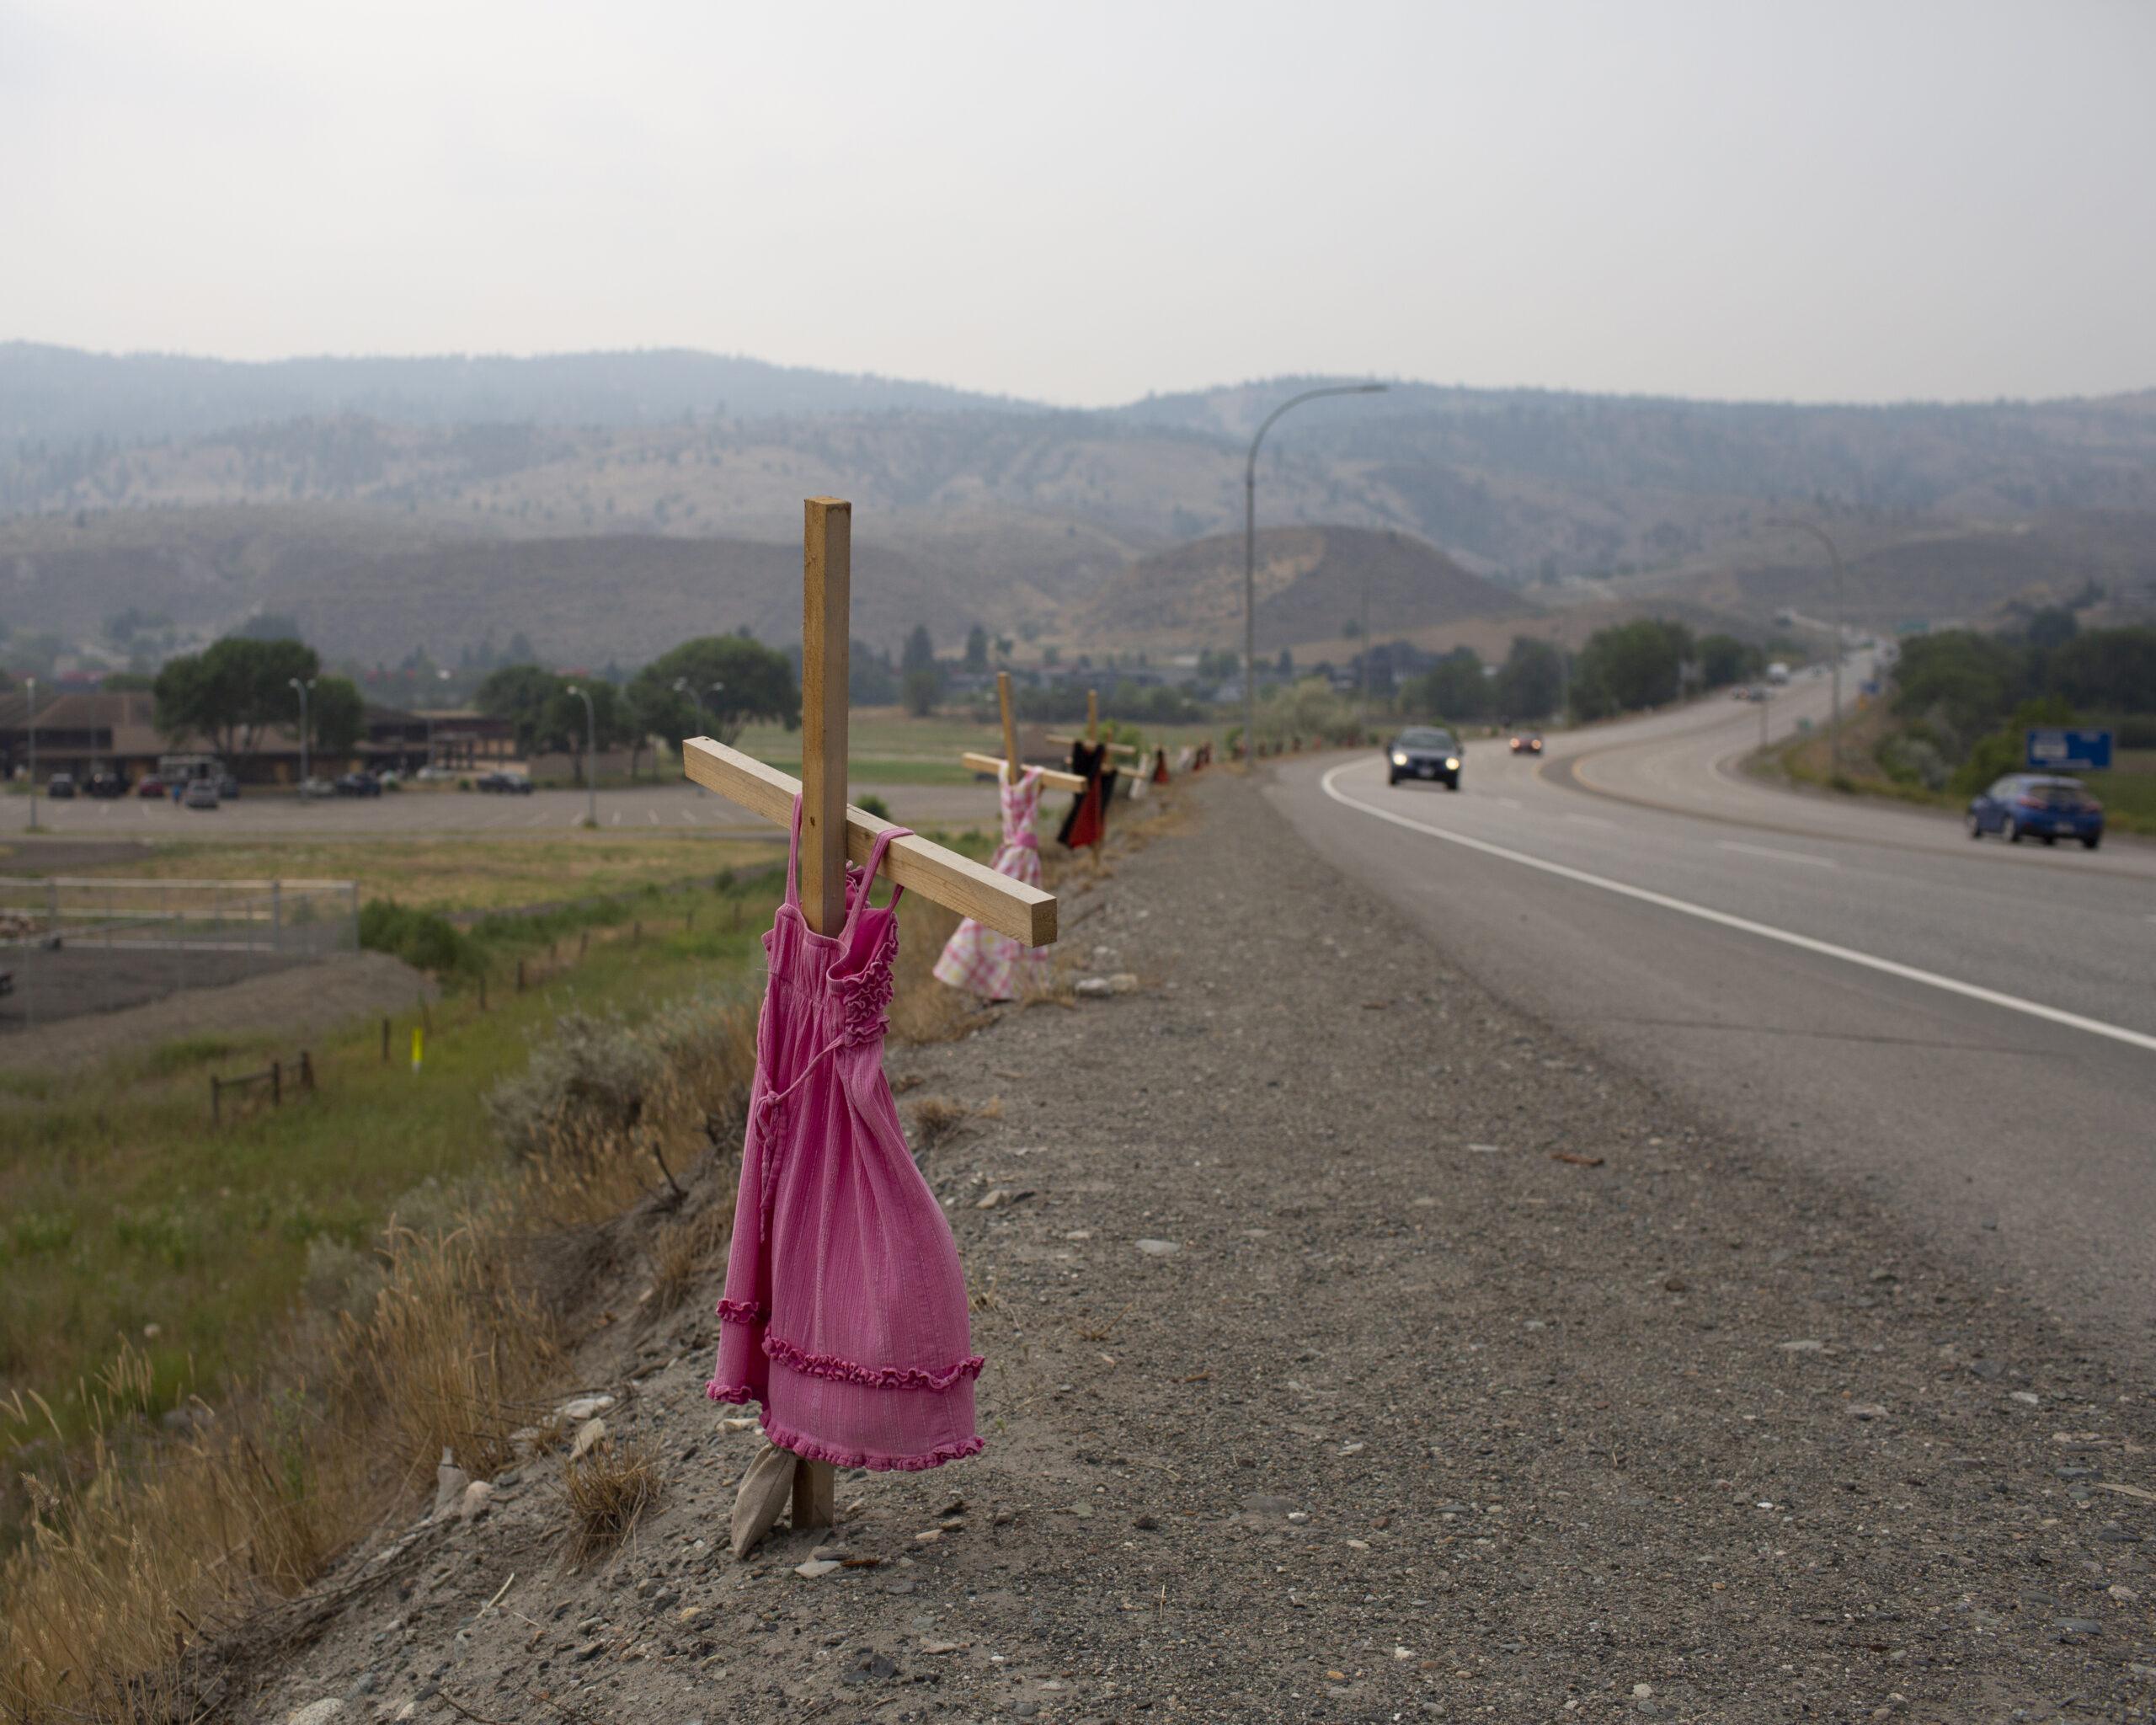 dresses hung on crosses along a road